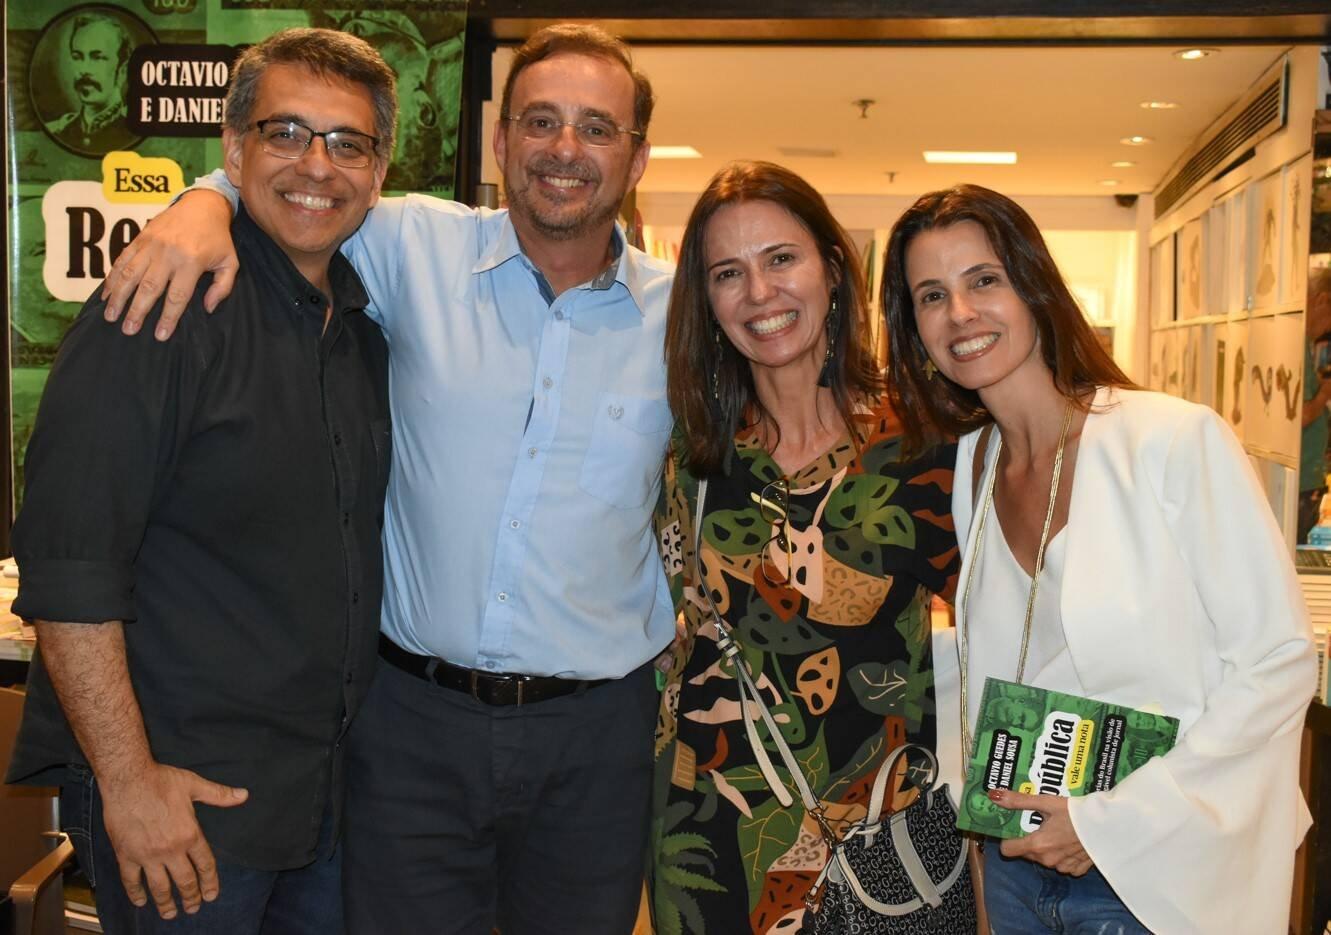 Gustavo Gavina, Octavio Guedes, Claudia e Denise Almada  /Foto: Cristina Lacerda